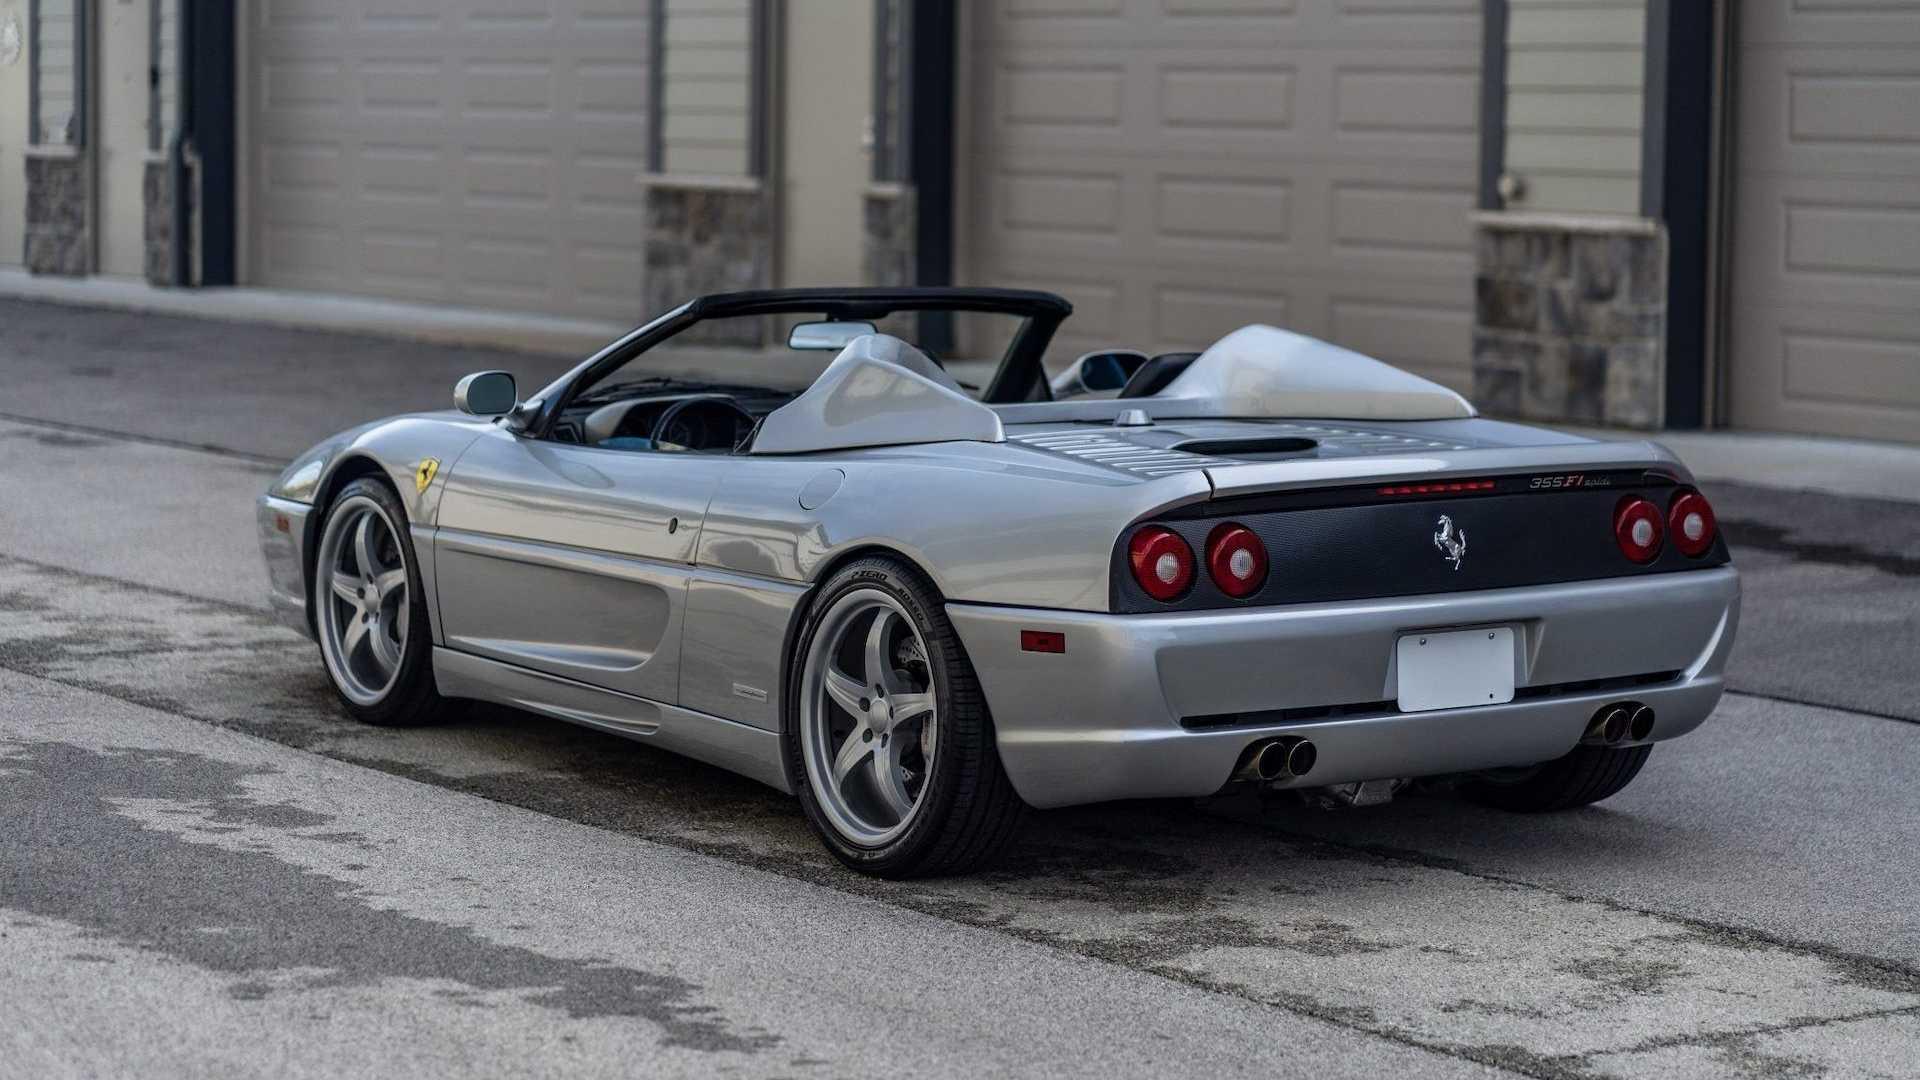 Shaquille O'Neal's 1998 Ferrari F355 Spider